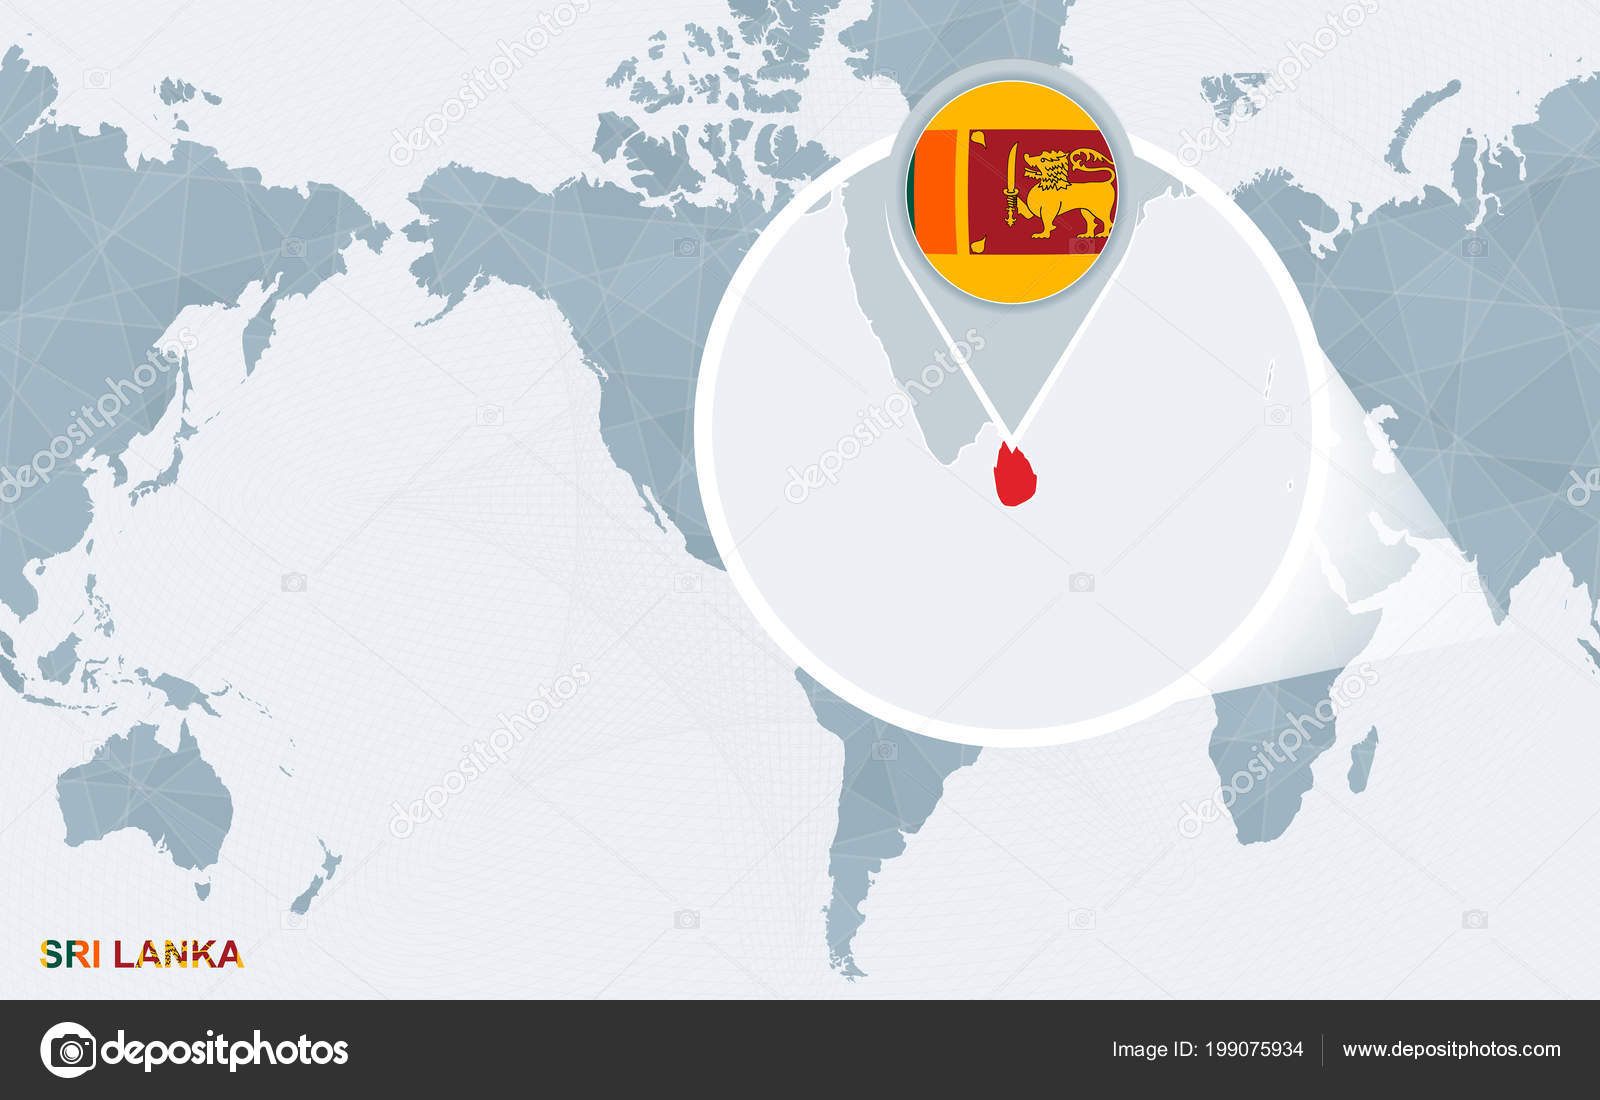 World Map Centered America Magnified Sri Lanka Blue Flag Map — Stock ...